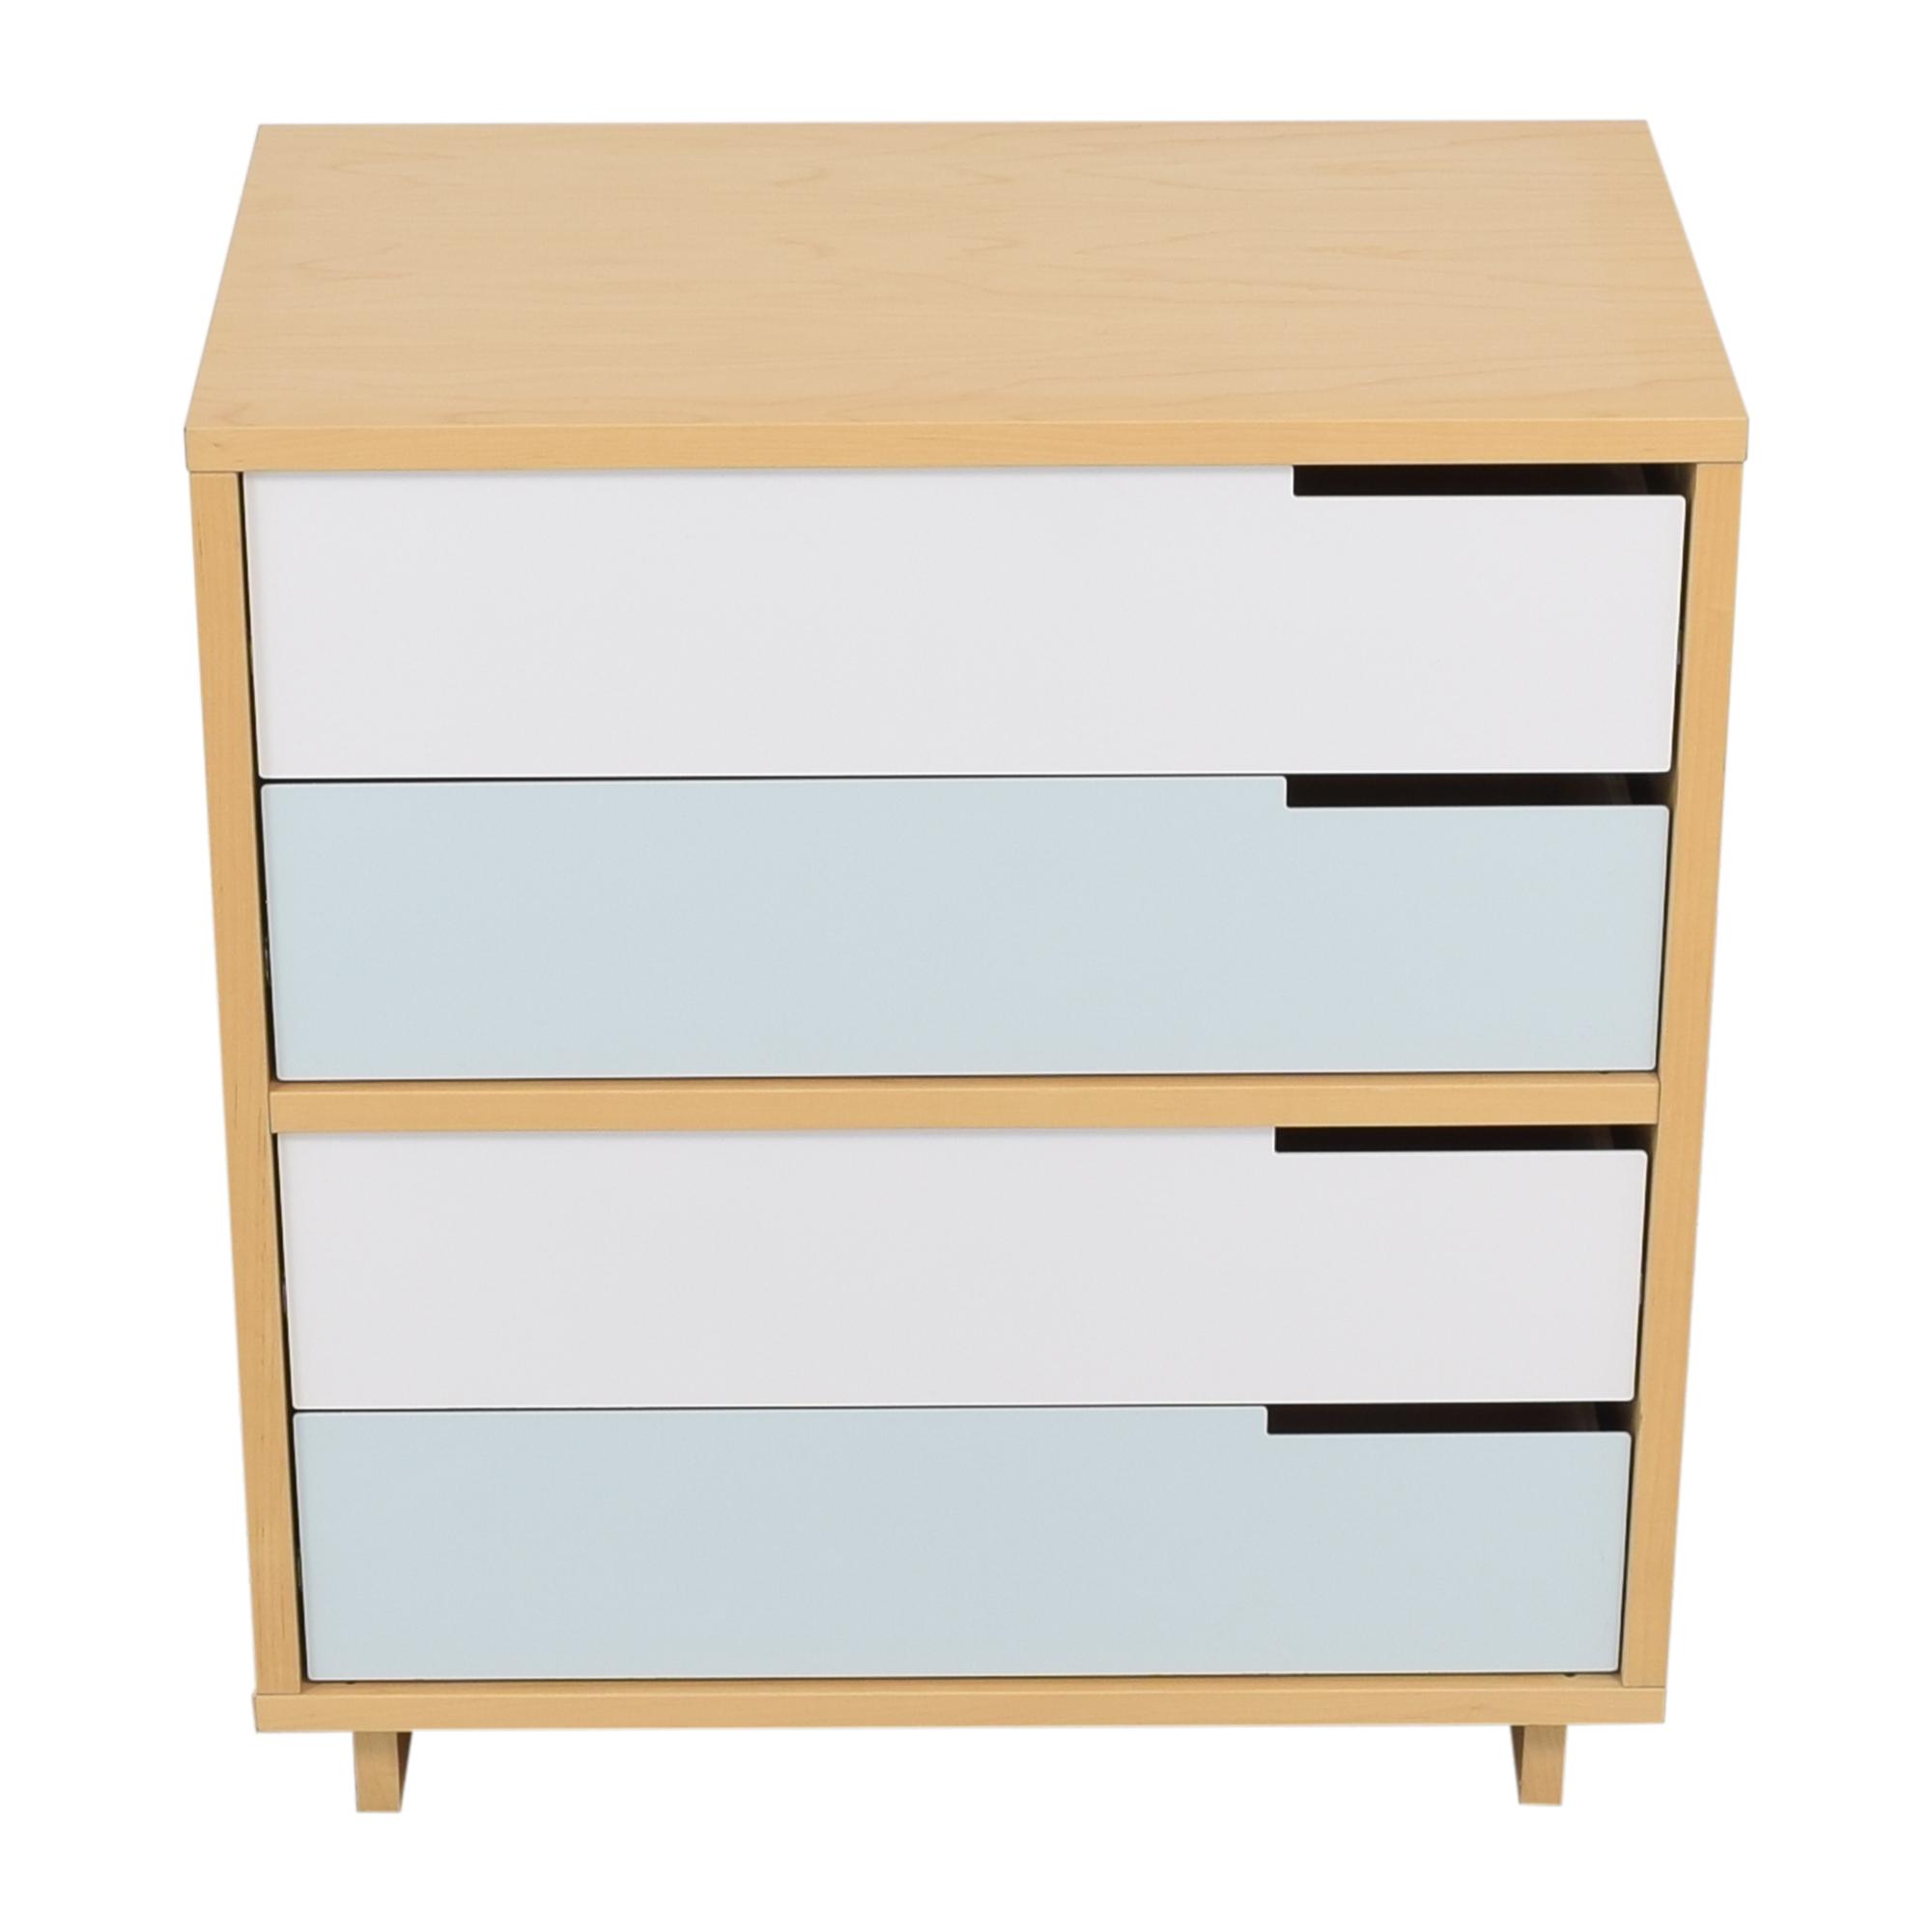 buy Blu Dot Modu-licious #4 Dresser Blu Dot Dressers